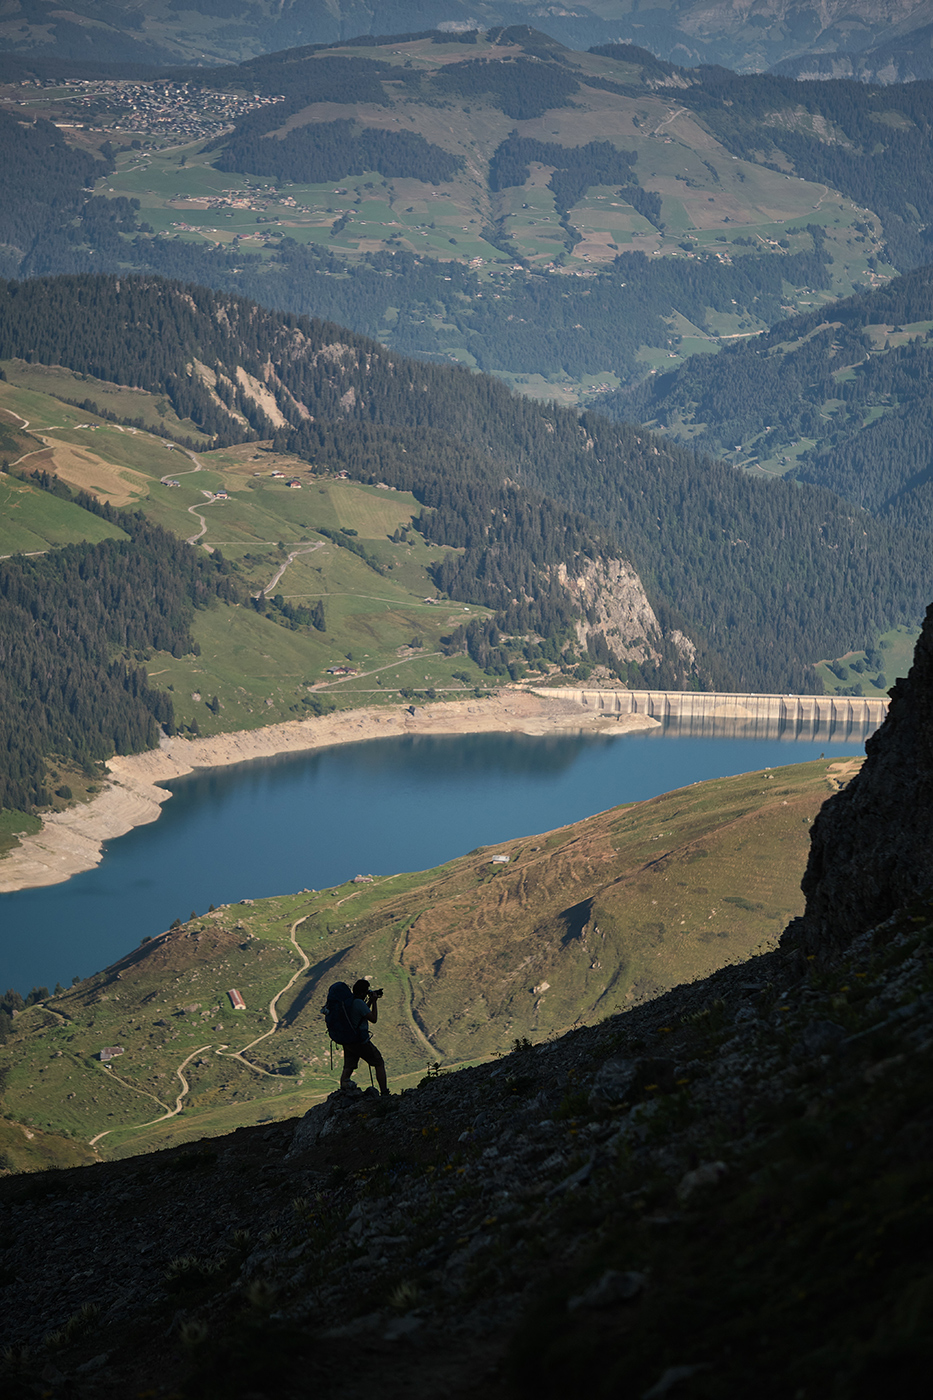 Lac de Roselend depuis la Pierra menta